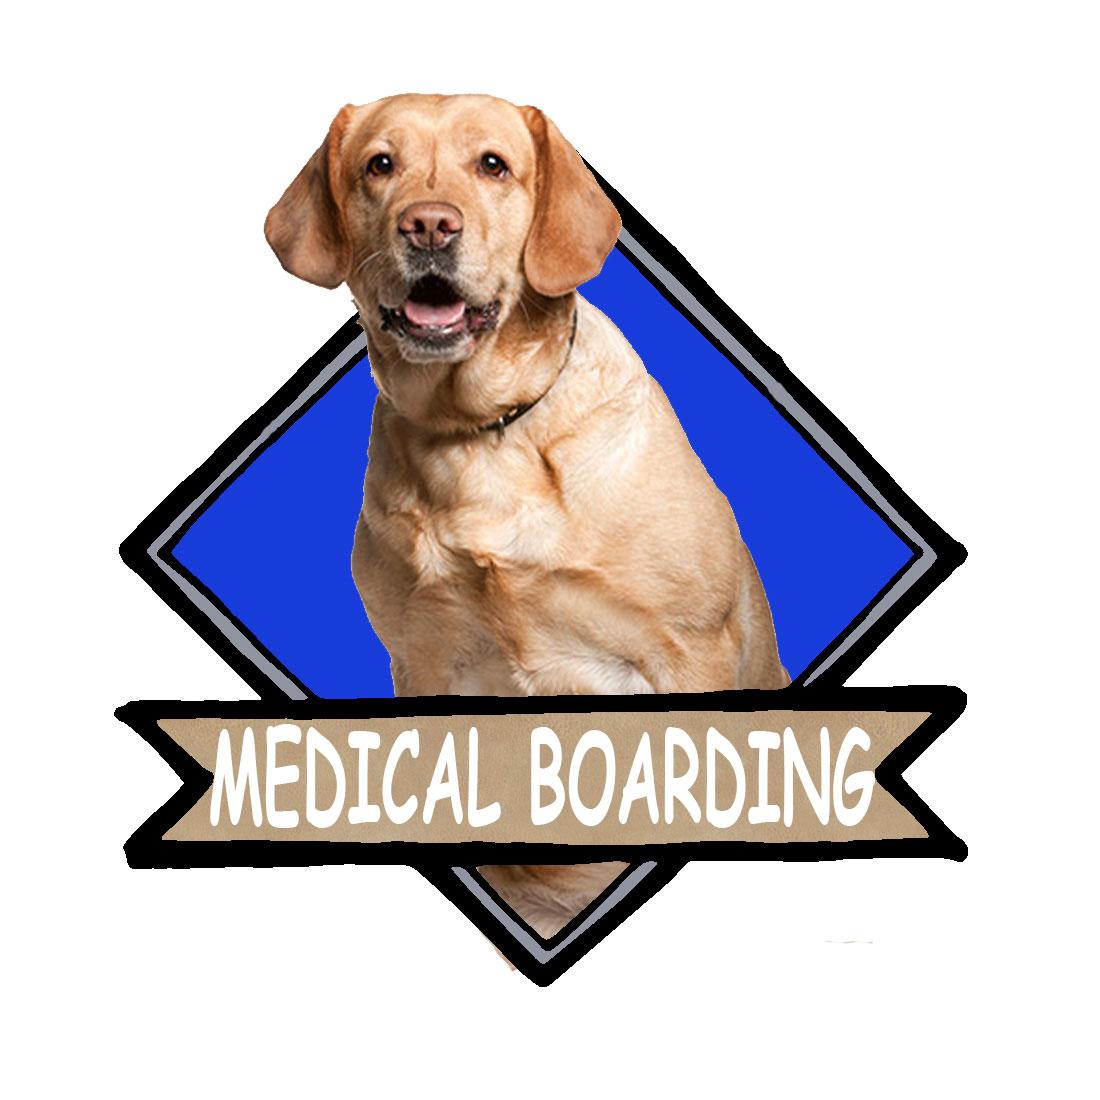 Medical Boarding